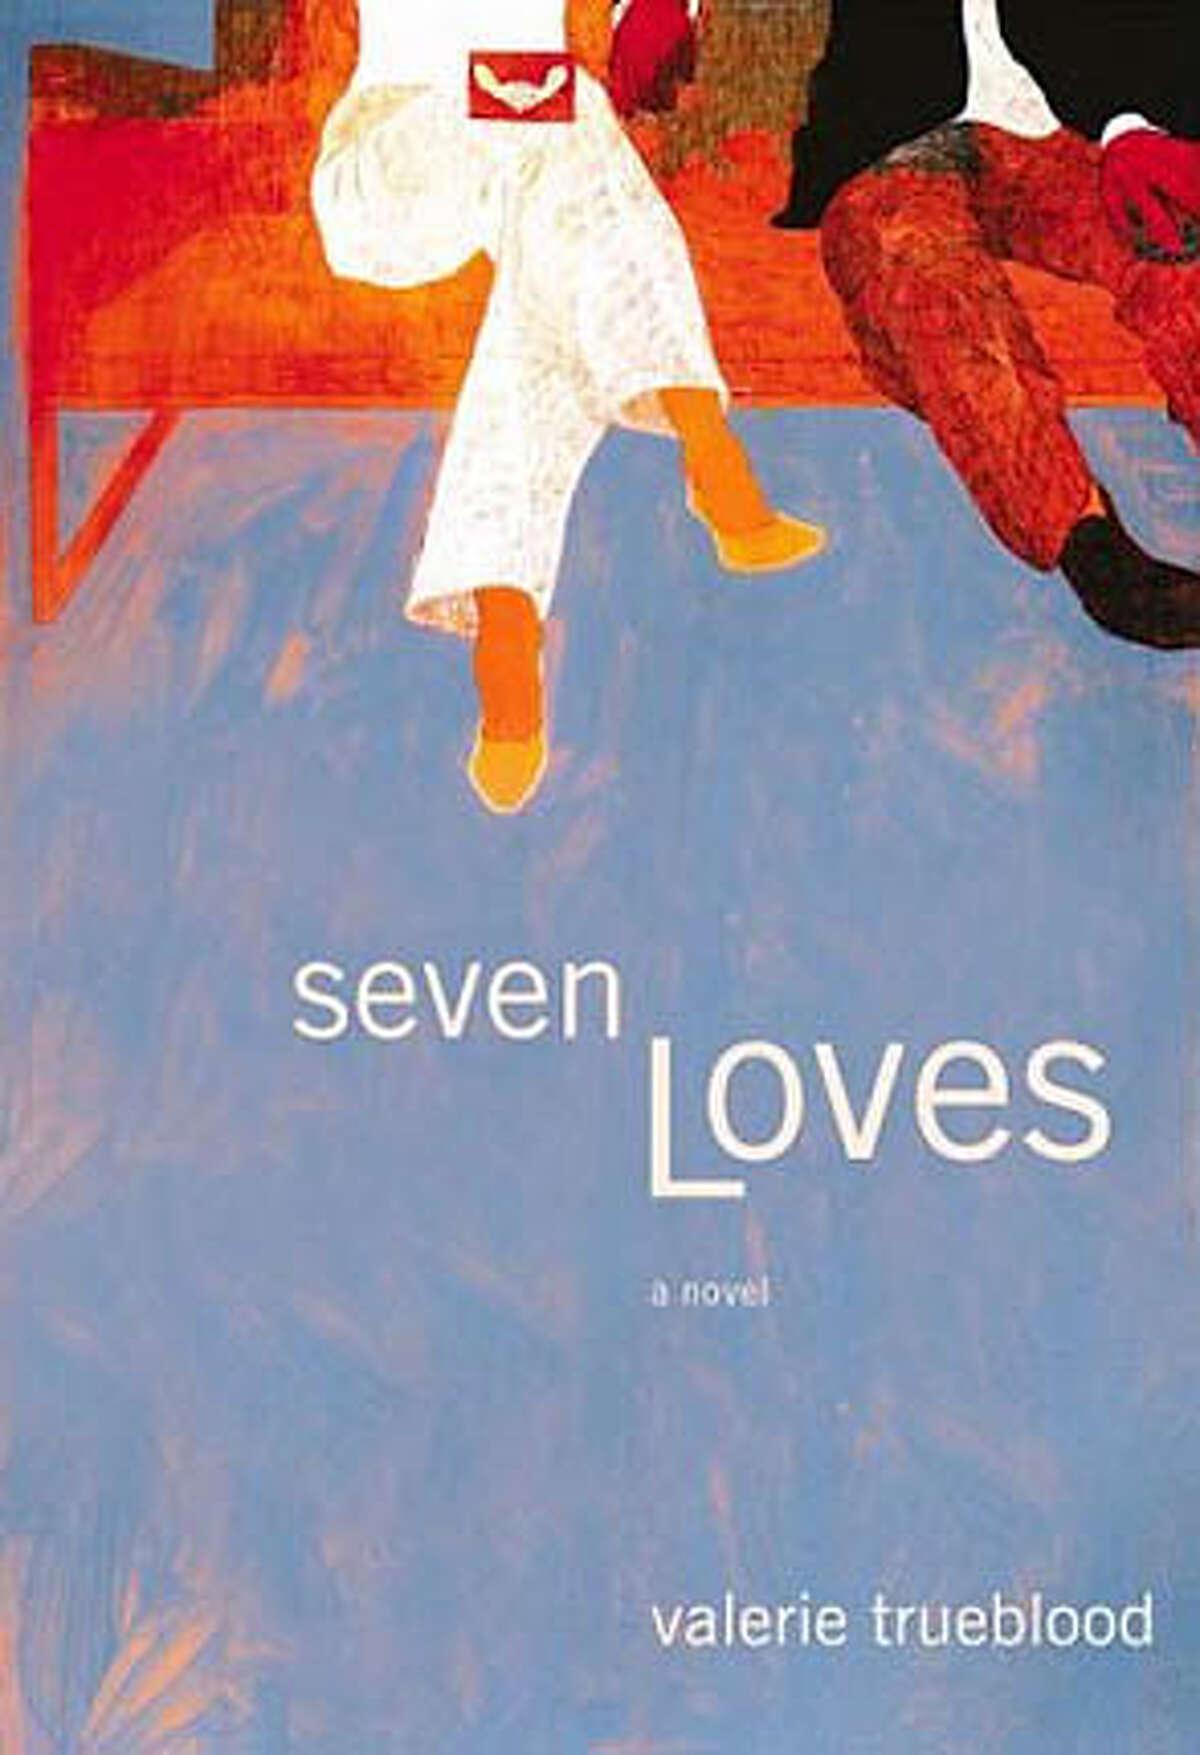 """Seven Loves"" by Valerie Trueblood"